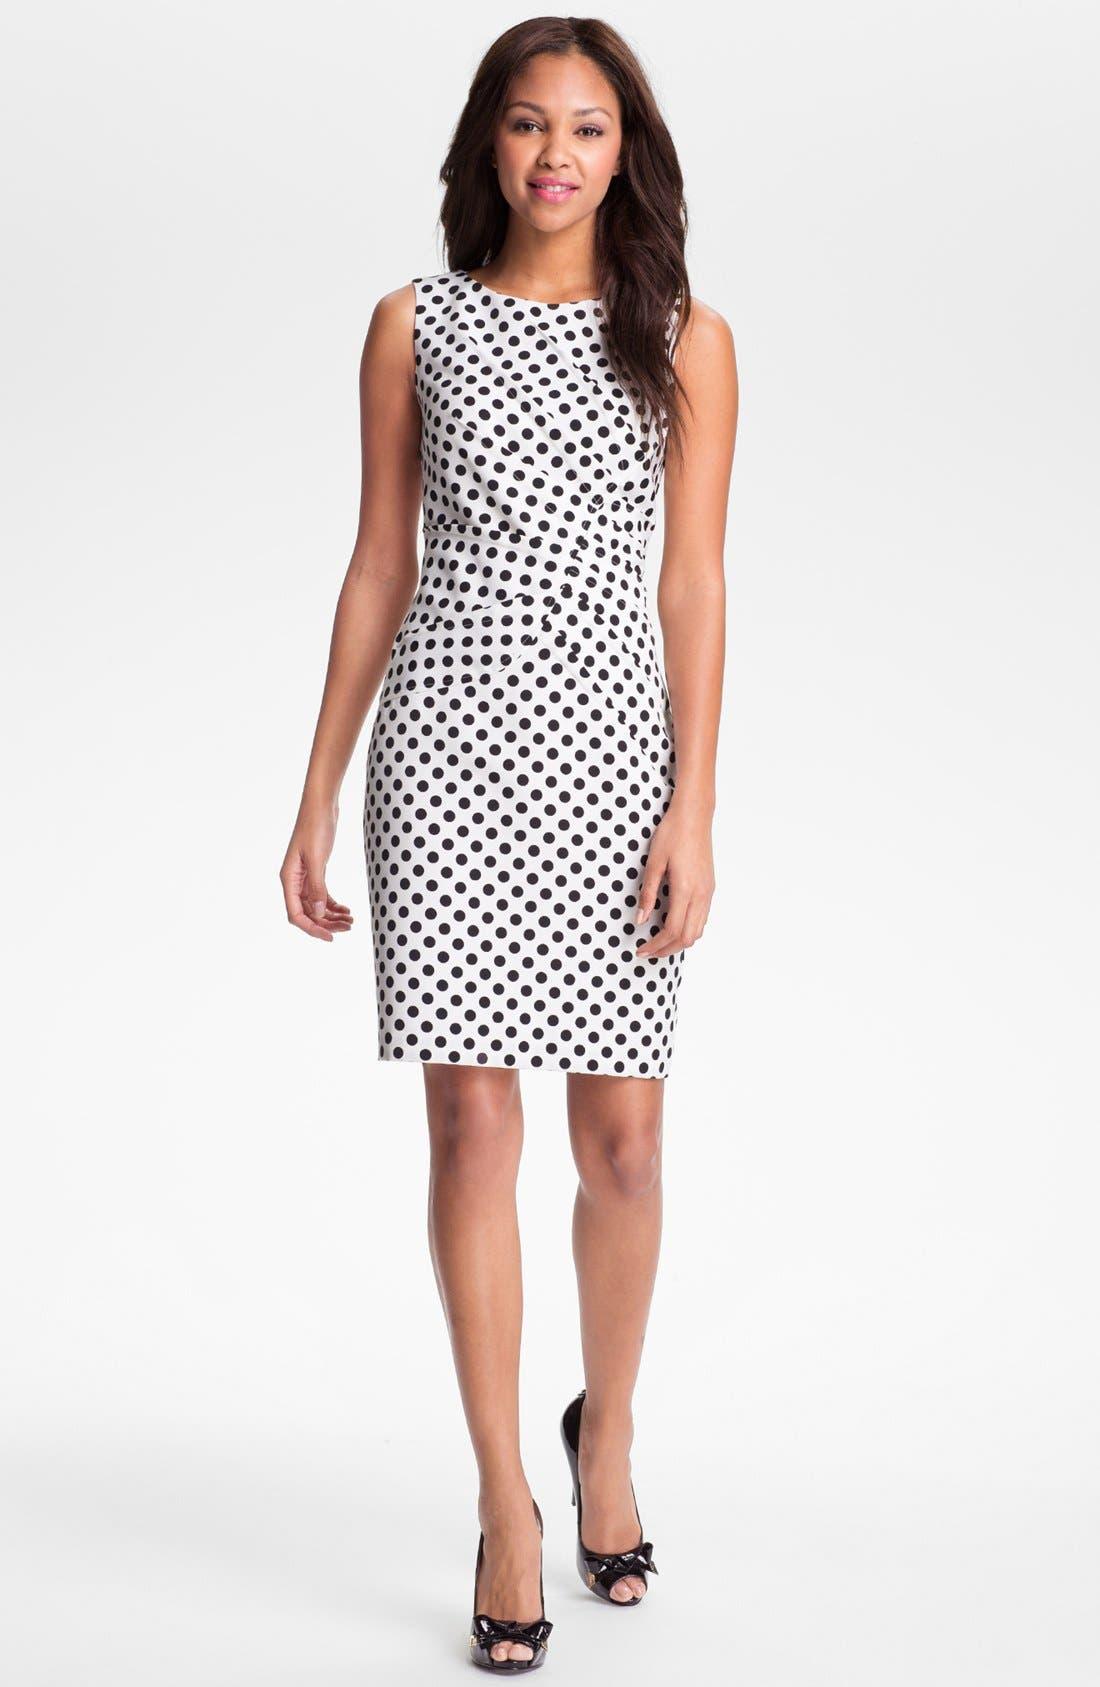 Alternate Image 1 Selected - Adrianna Papell Pleated Polka Dot Sheath Dress (Regular & Petite)